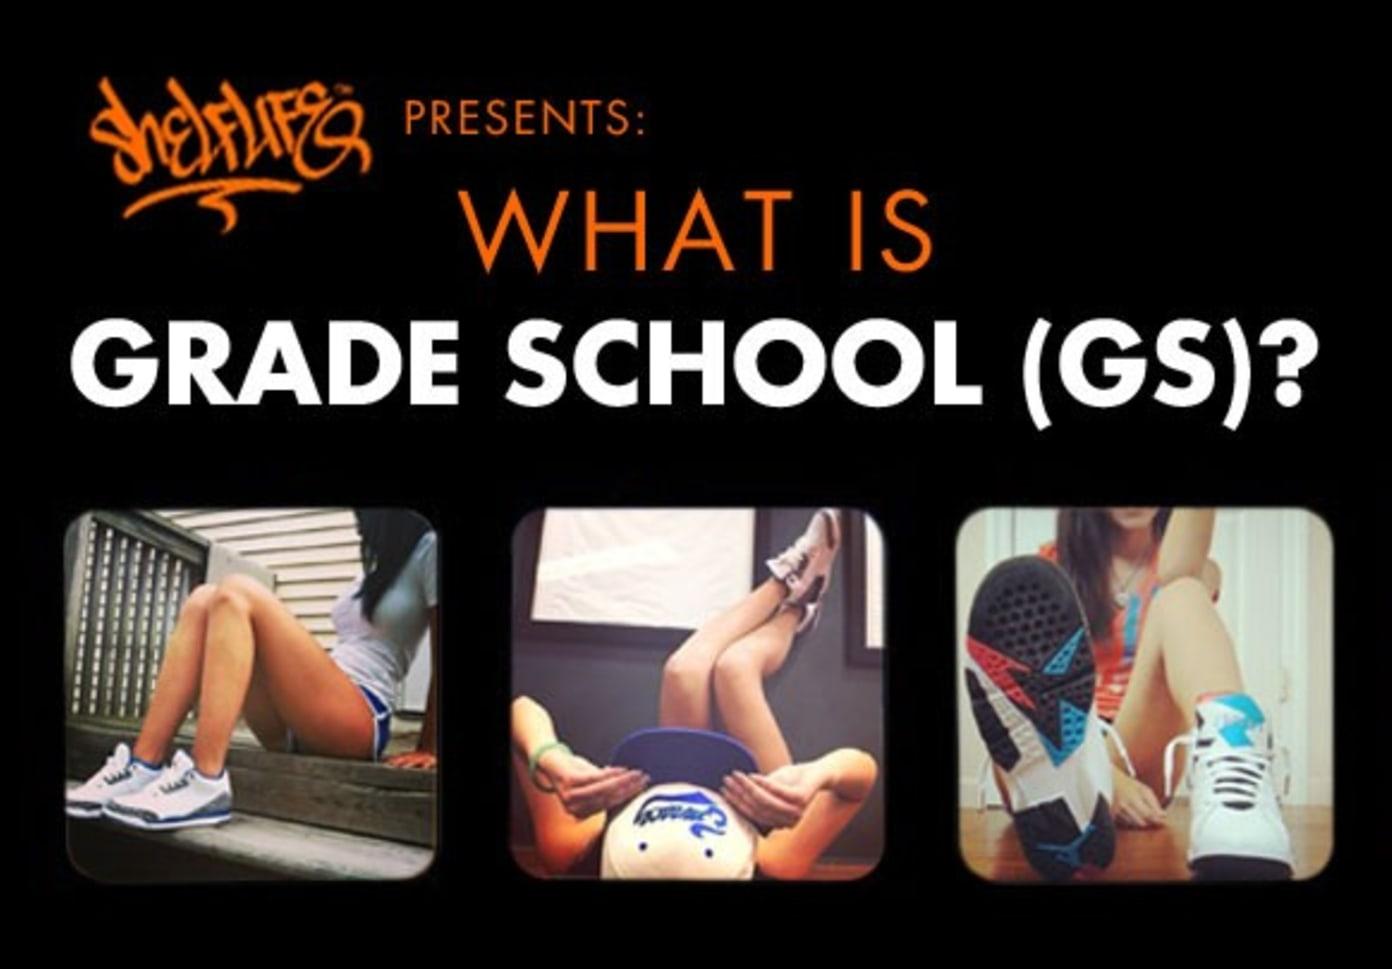 What is Grade School (GS)?